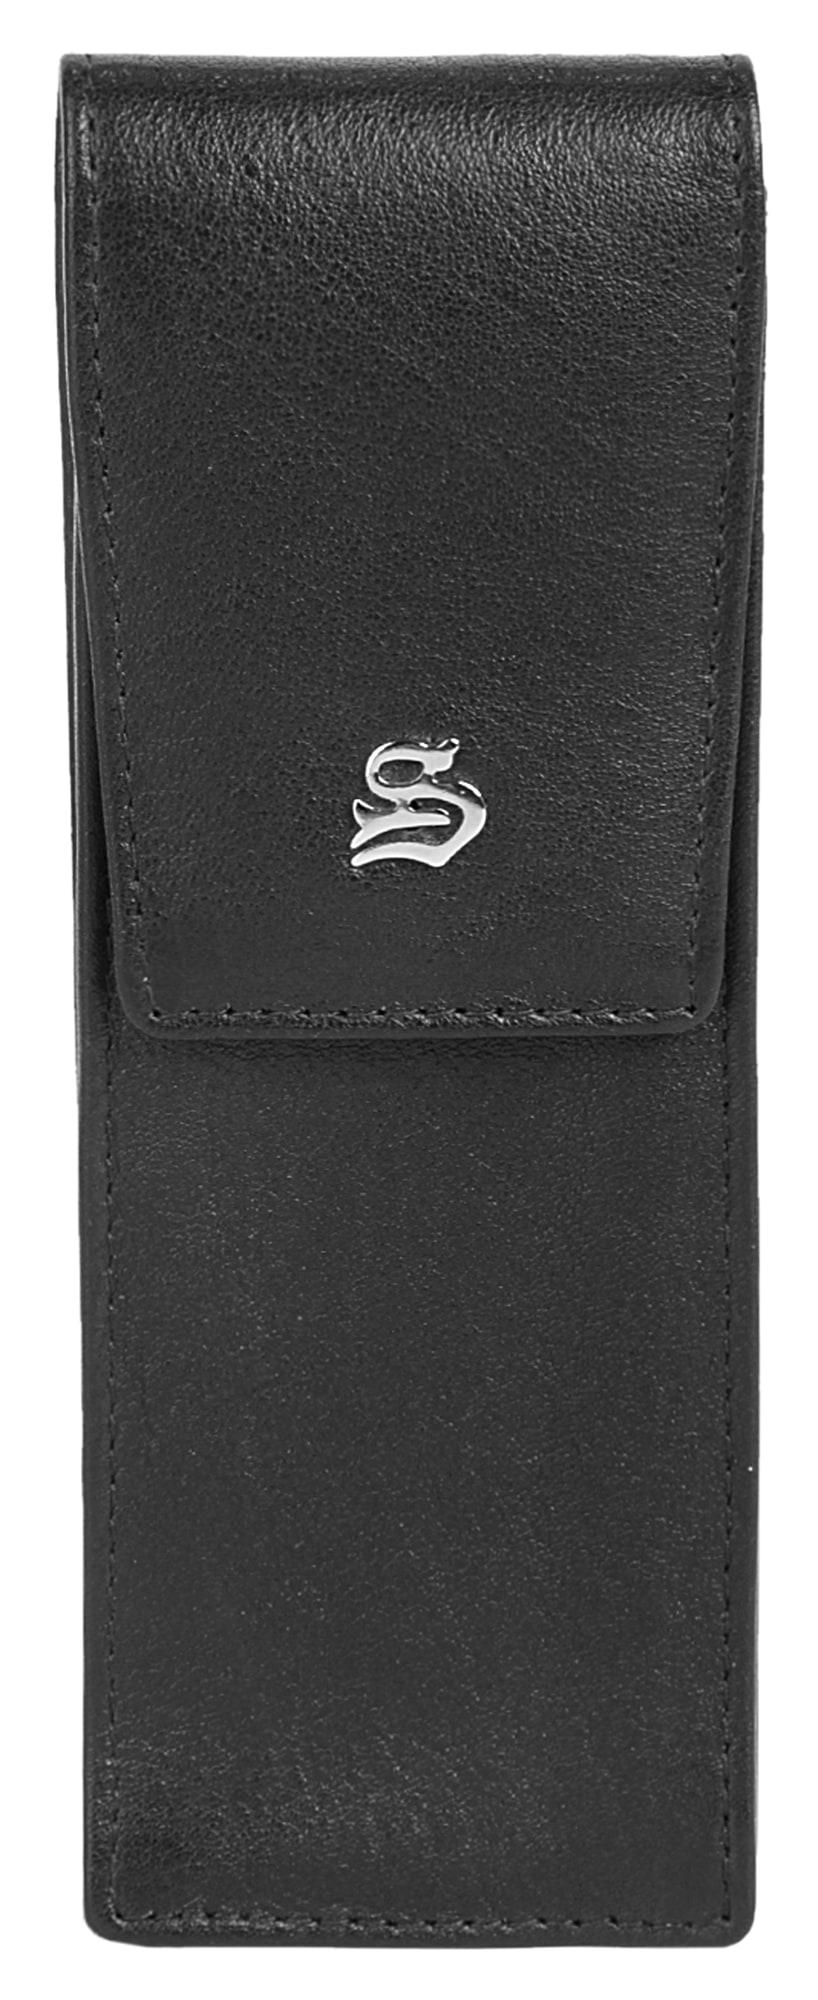 Image of Szuna Brieftasche